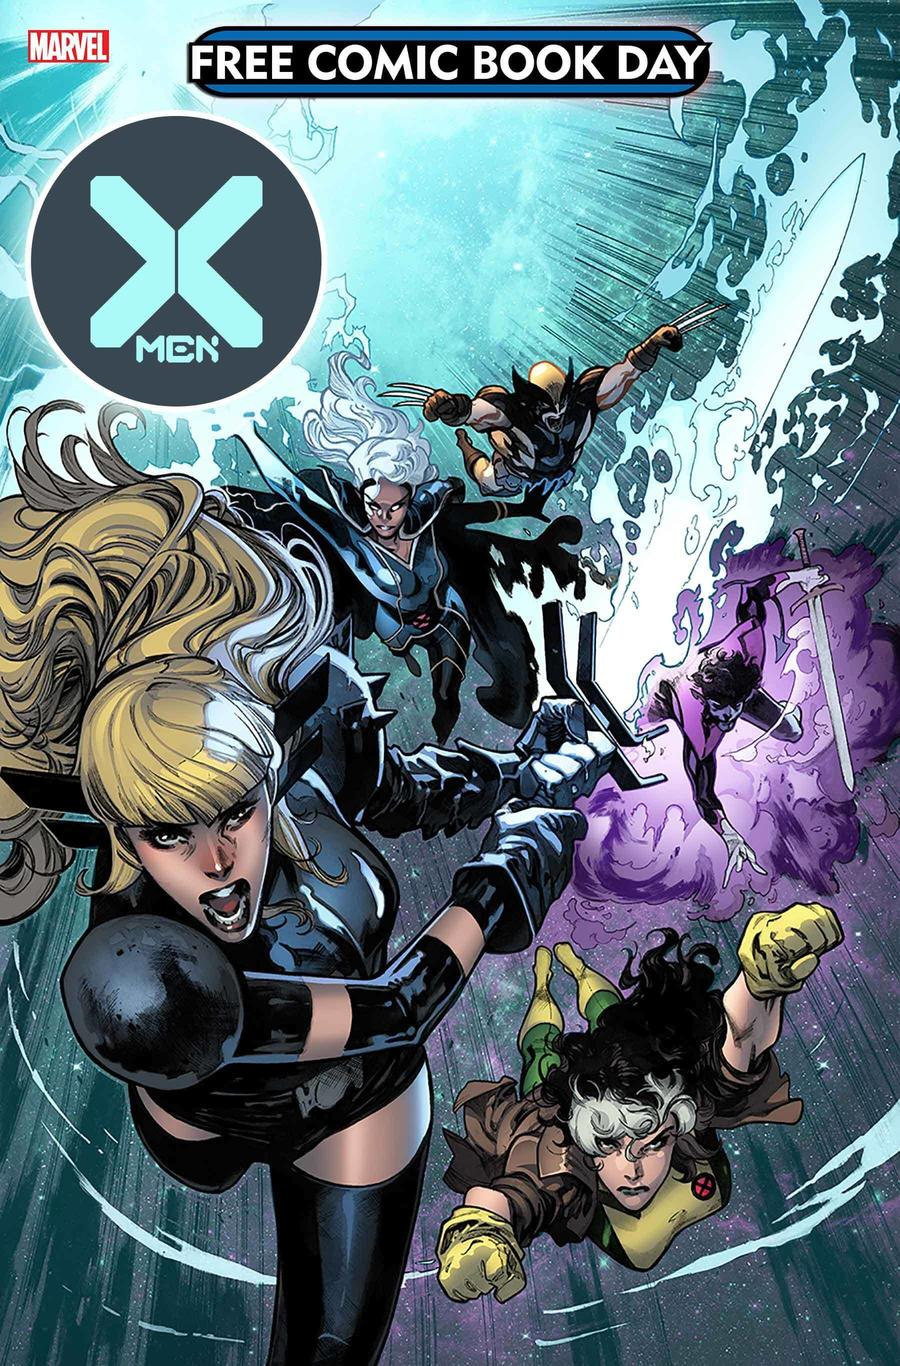 FREE COMIC BOOK DAY 2020: X-MEN